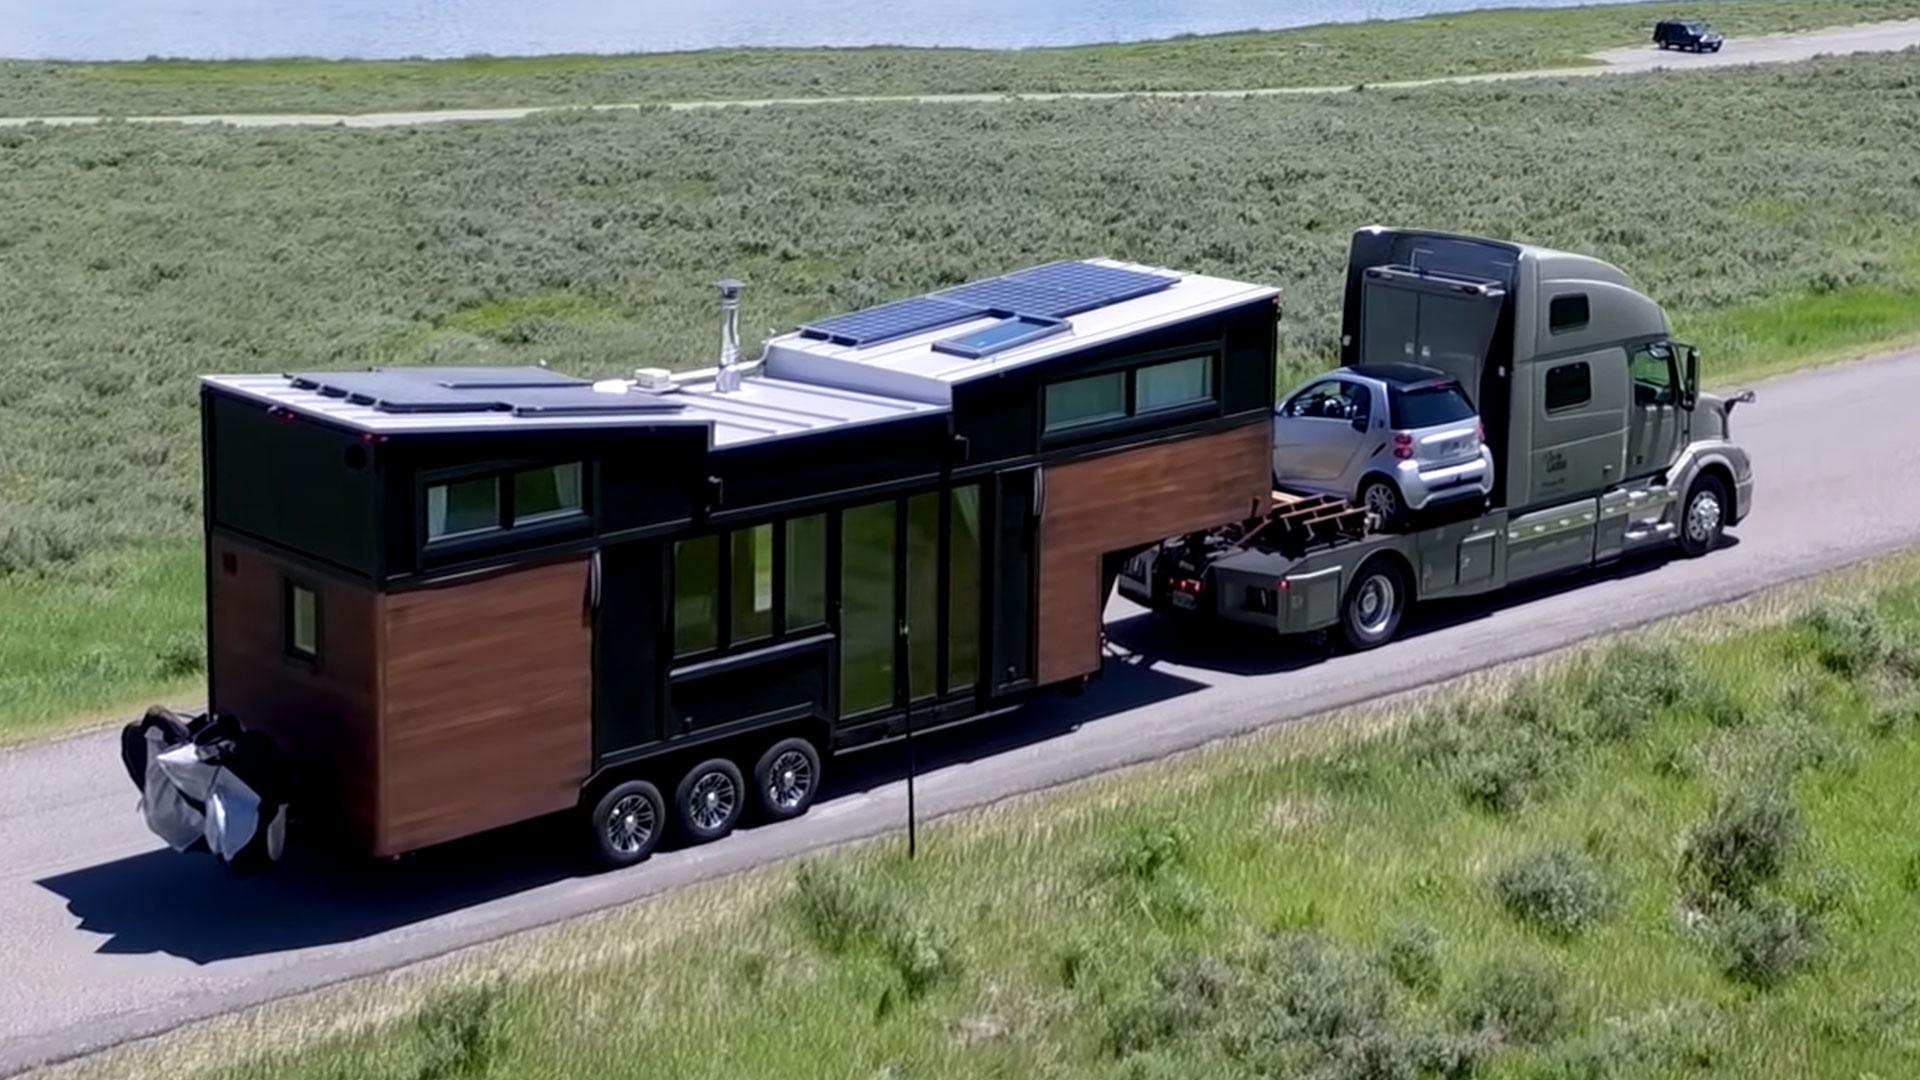 Mobiele tiny house gebruikt Tesla-batterijen